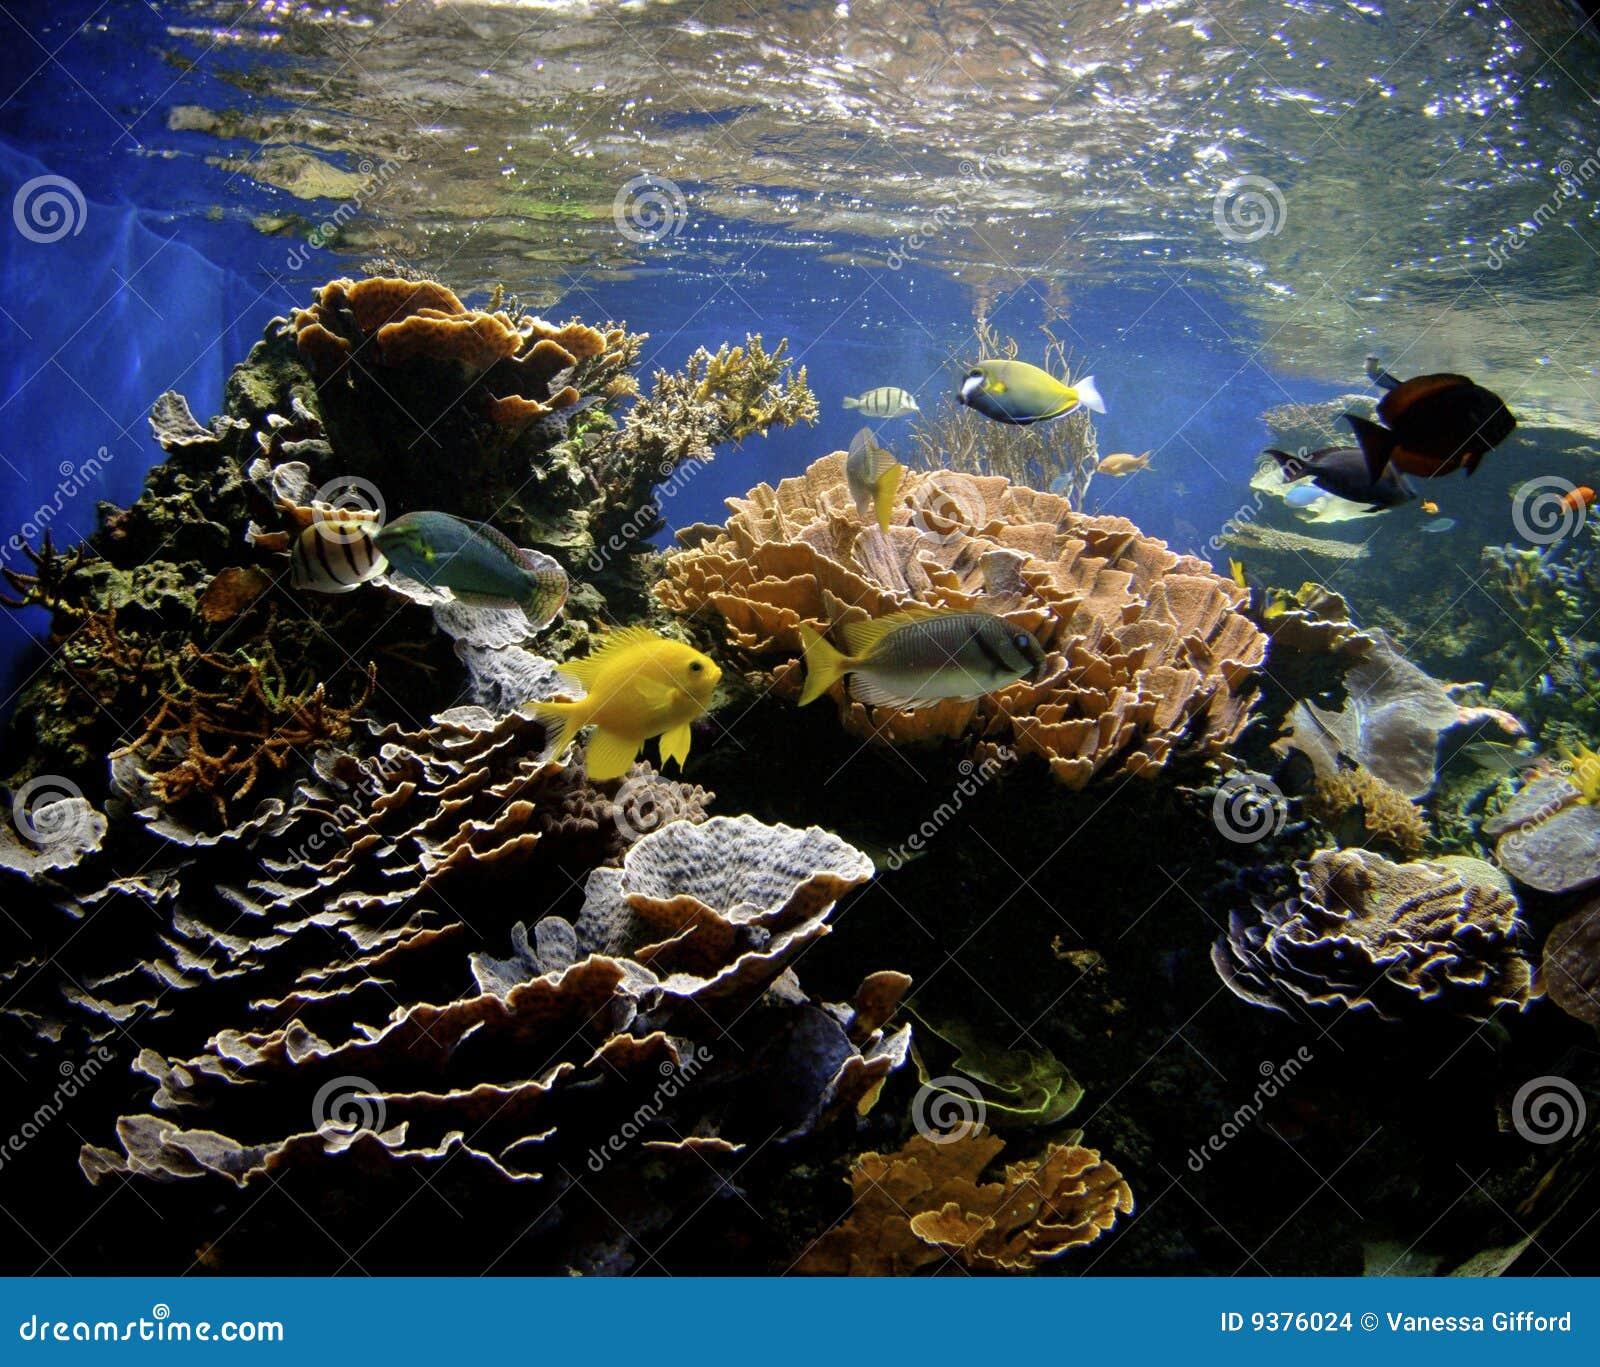 Hawaii Coral Reef Stock Photo. Image Of Animal, Marine